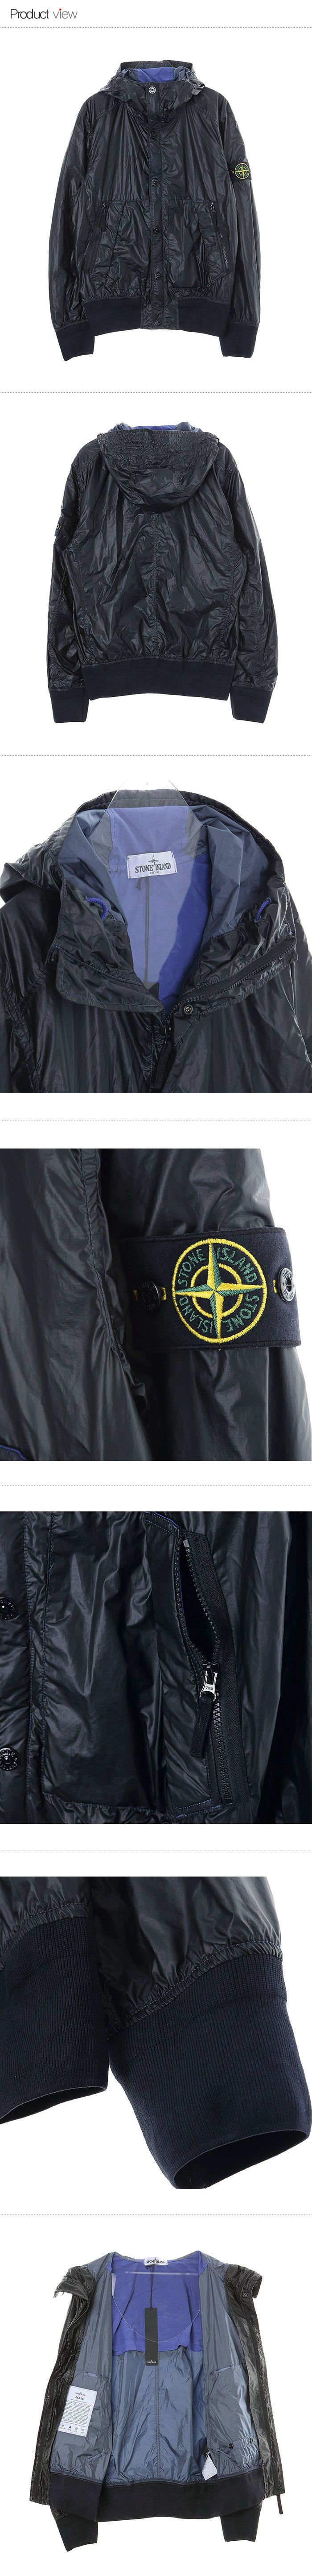 Stone Island 44b30 Garment Dyed Mussola Gommata Jacket In Black